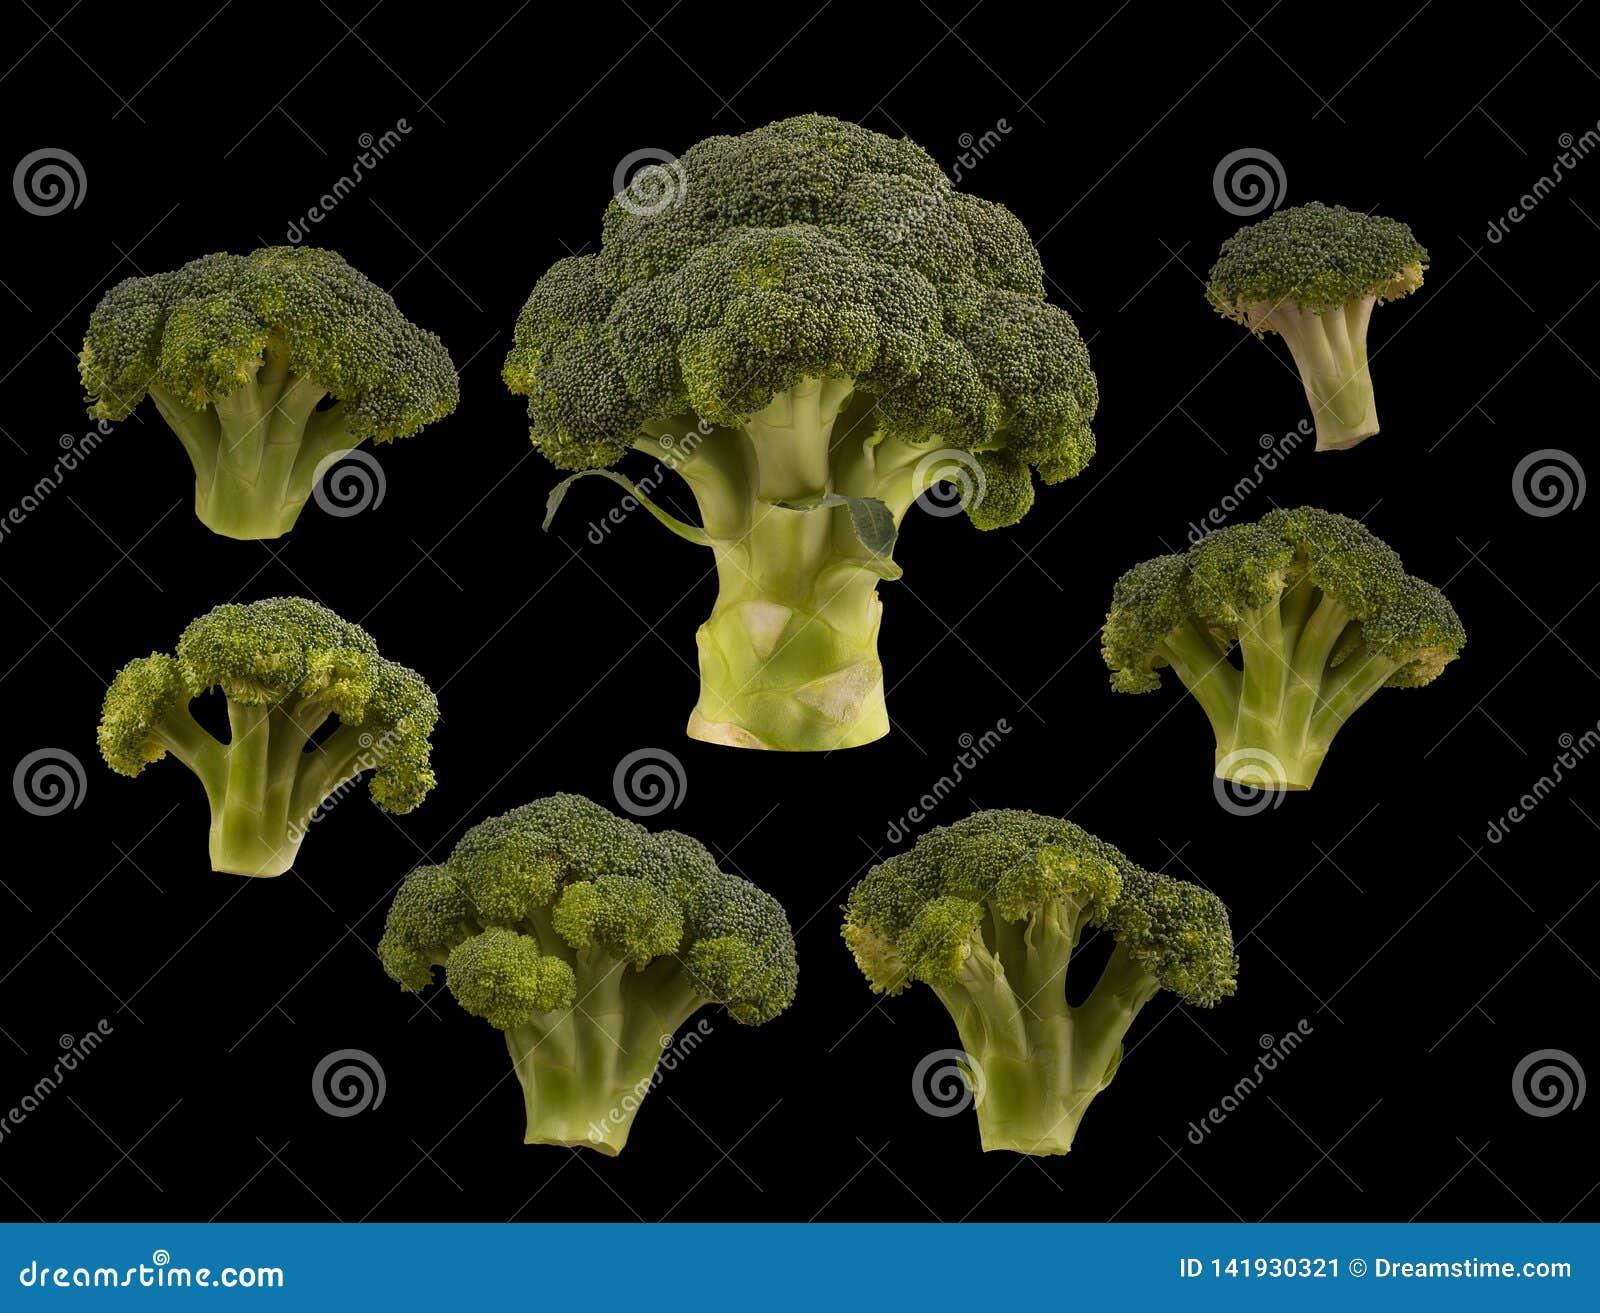 Set broccoli isolated on black background. Flat lay